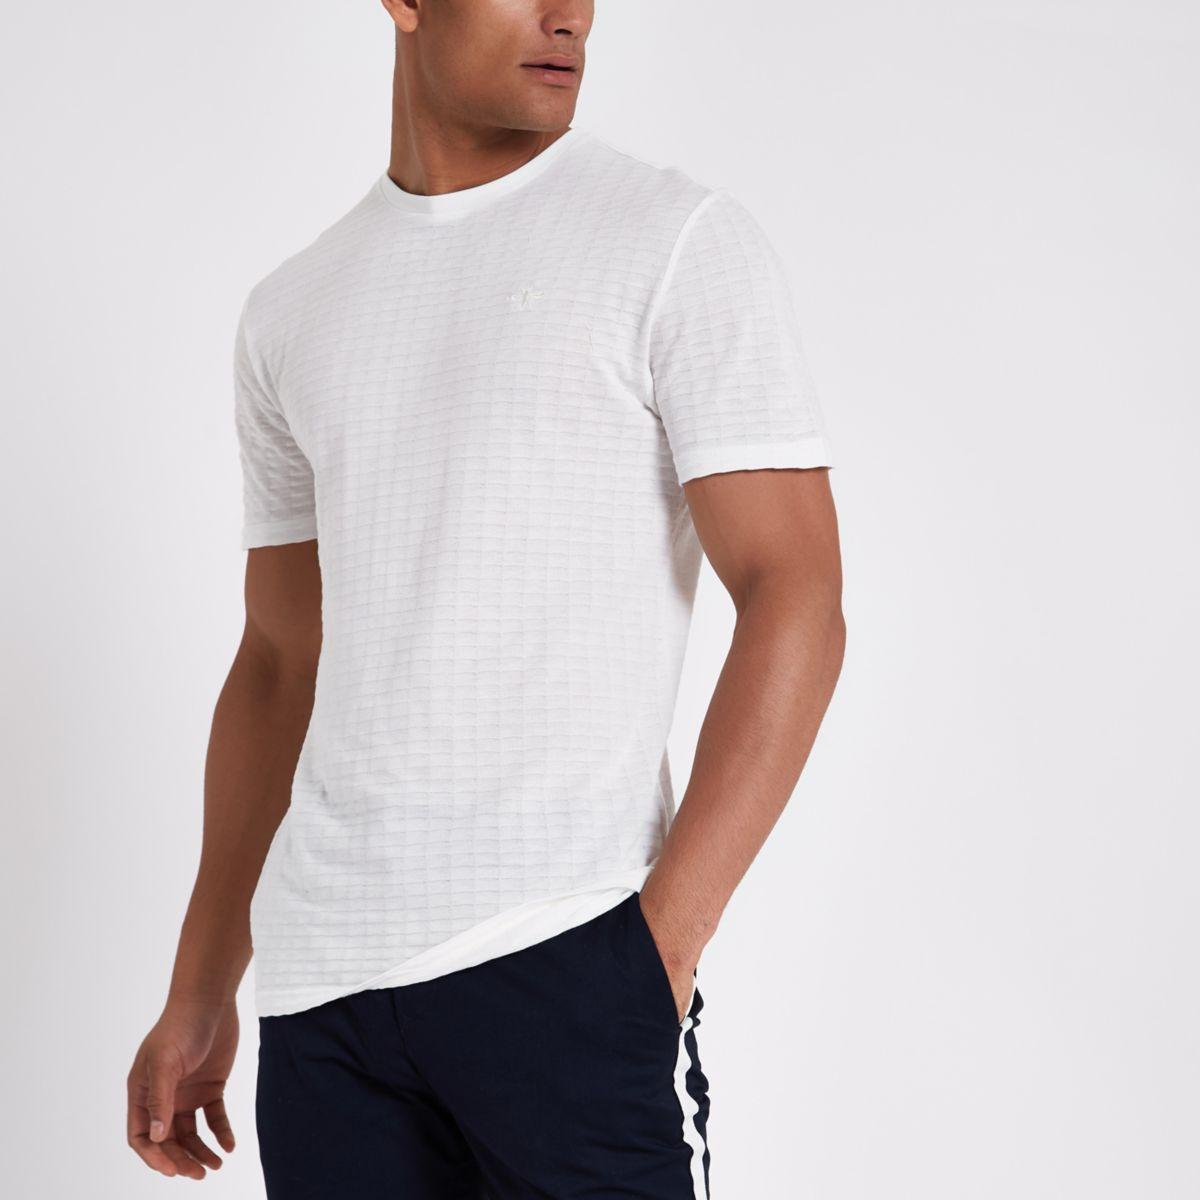 White waffle slim fit short sleeve T-shirt